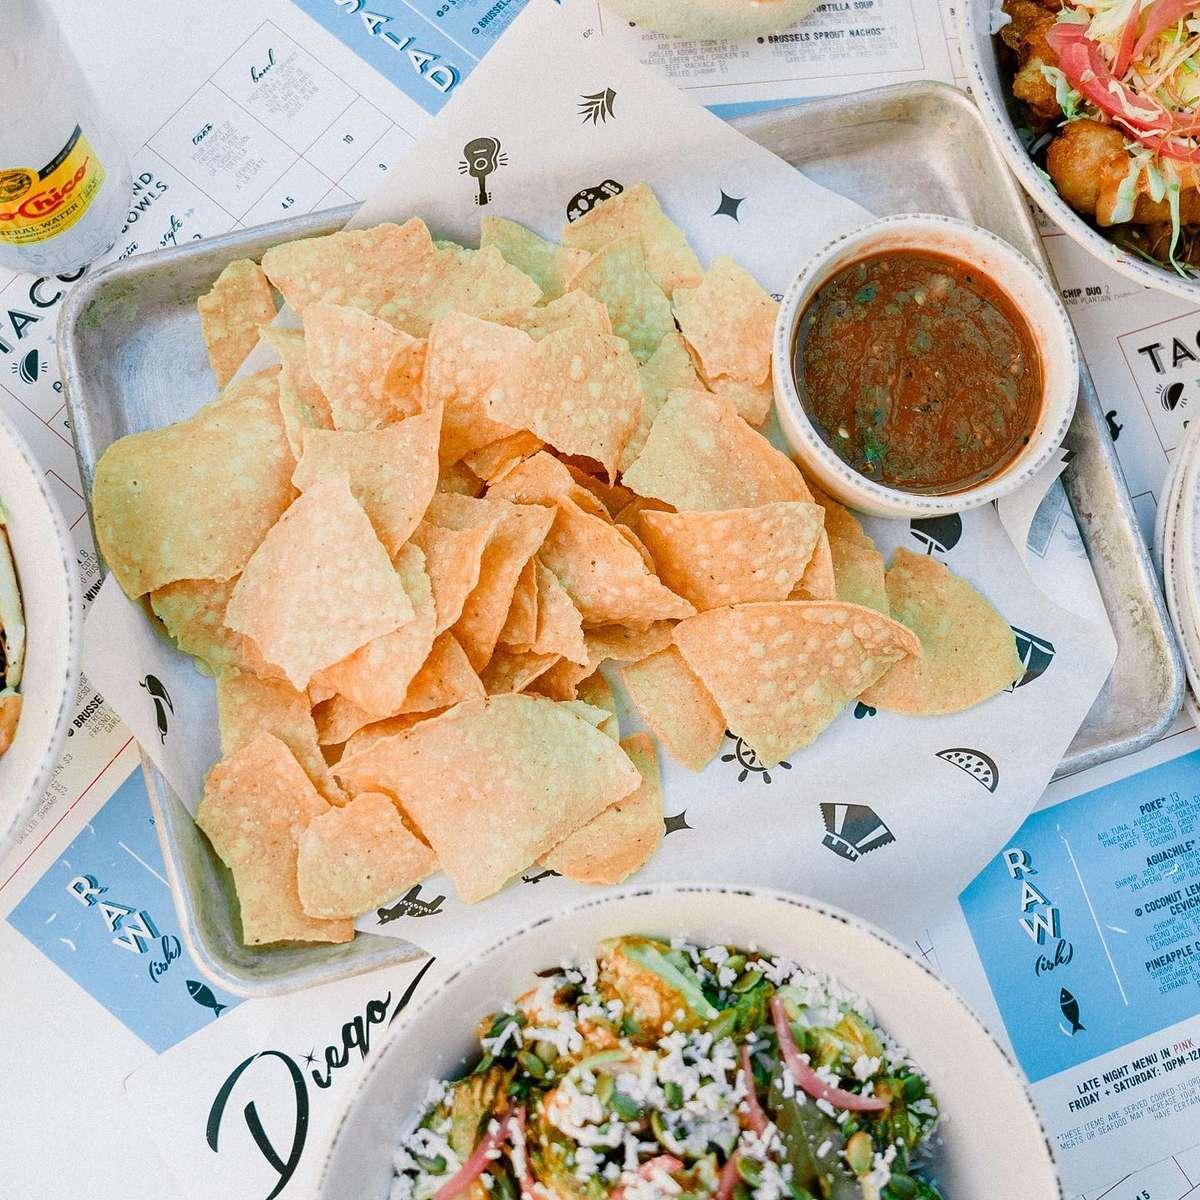 Chips + Salsa